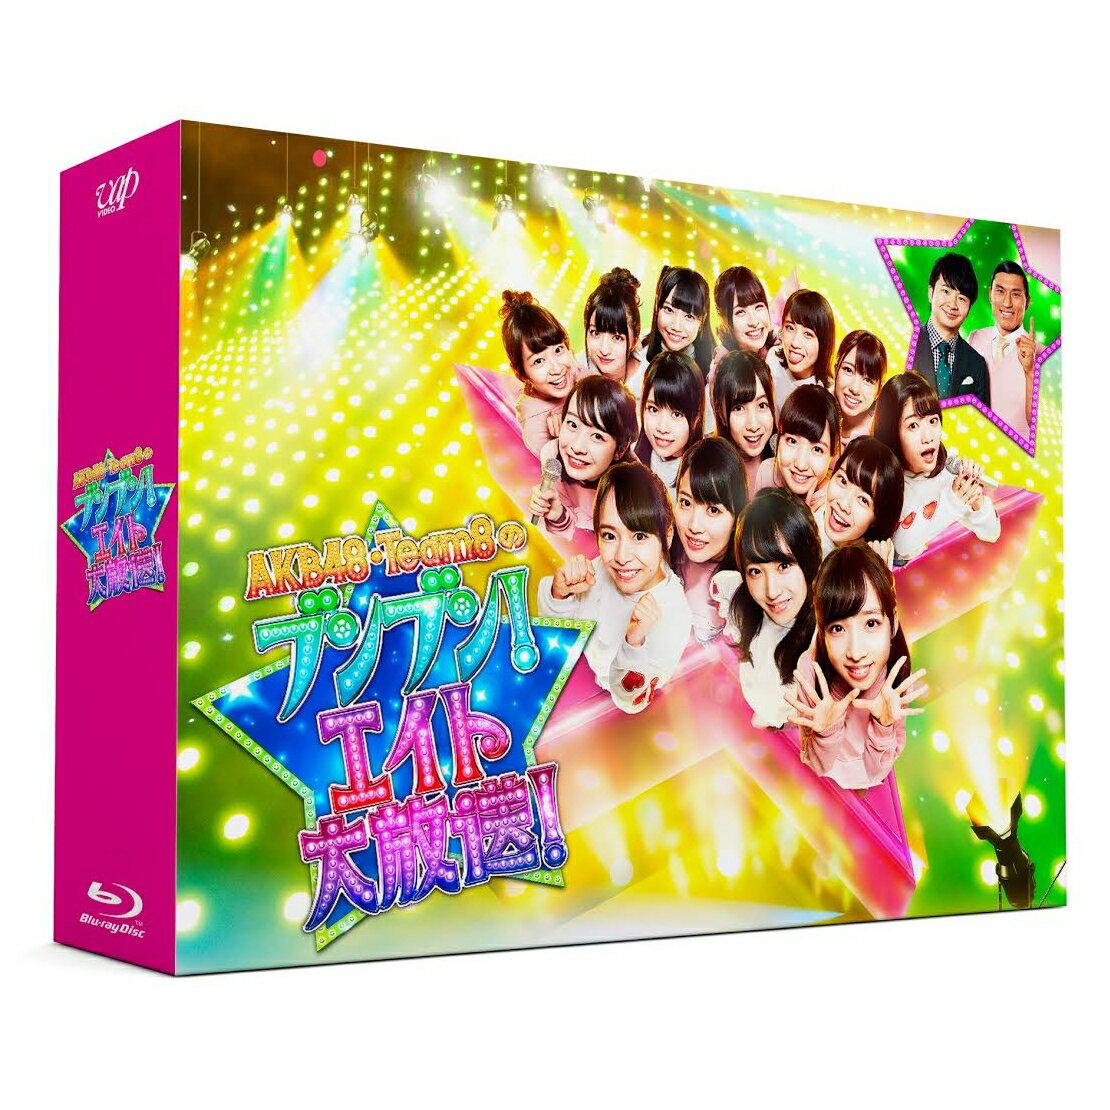 AKB48 チーム8のブンブン!エイト大放送! Blu-ray BOX【Blu-ray】 [ AKB48 ]